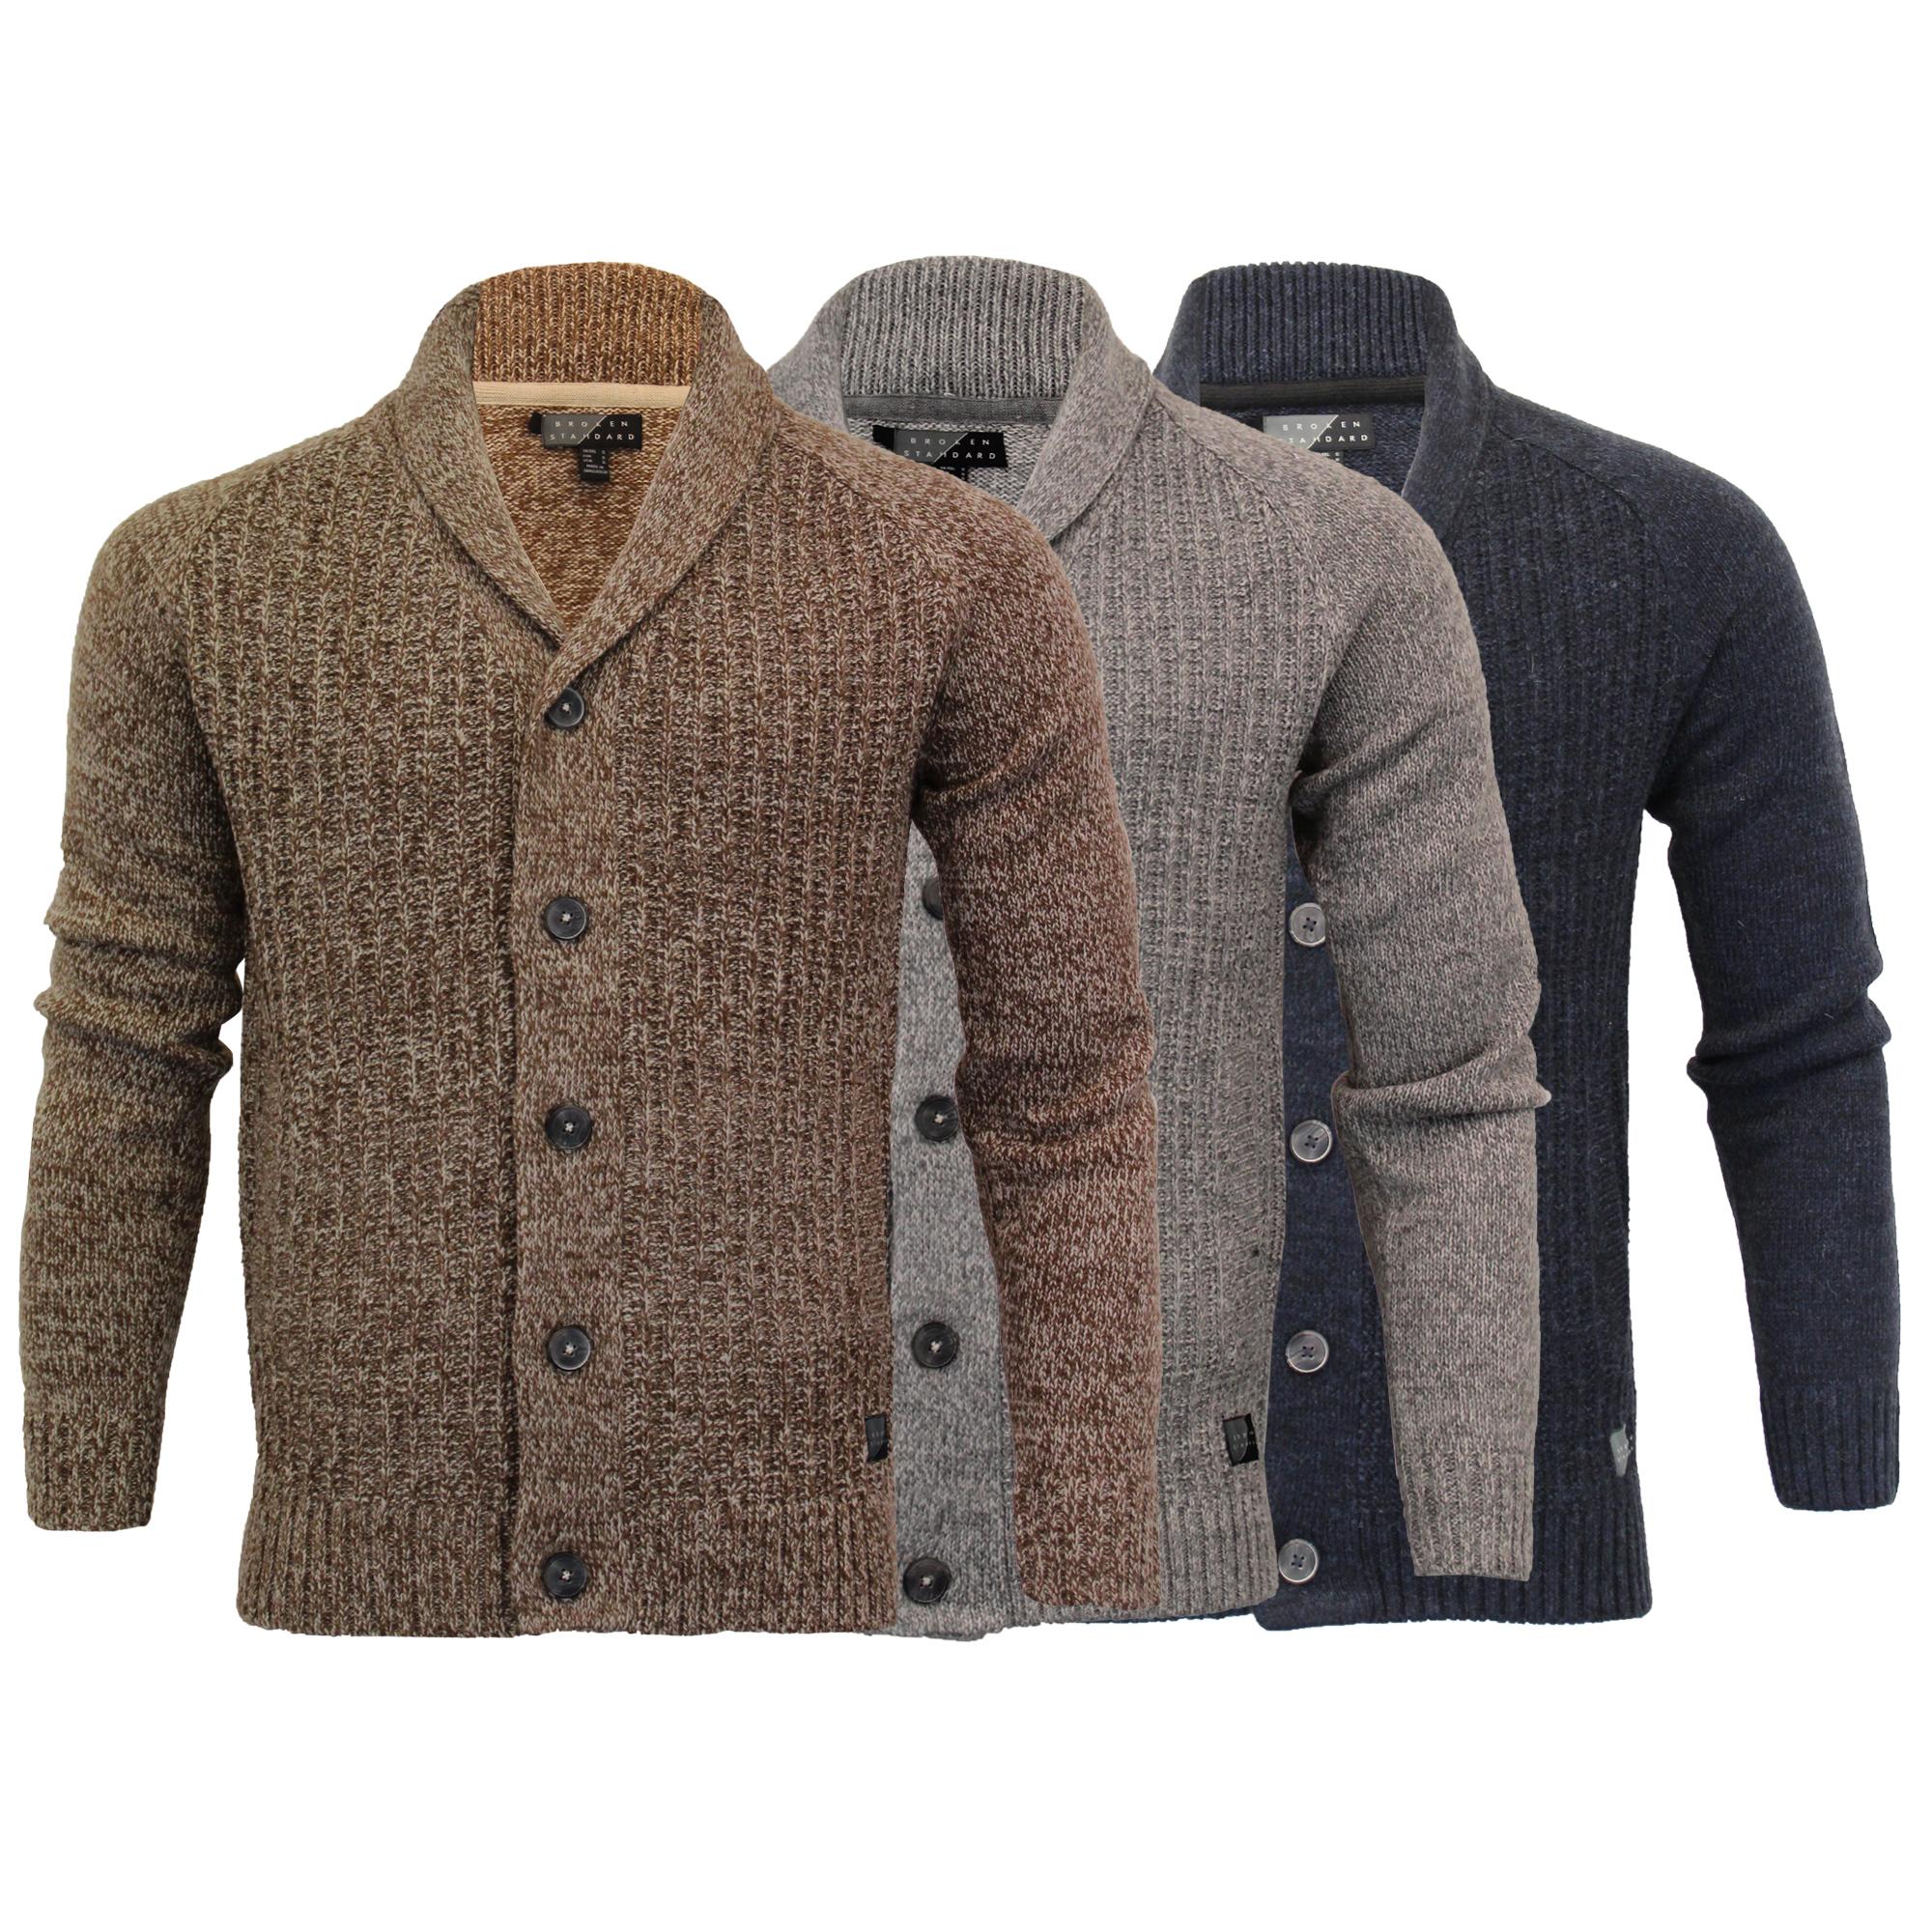 Mens-Wool-Mix-Cardigans-Threadbare-Knitted-Sweater-Broken-Standard-Shawl-Winter thumbnail 4